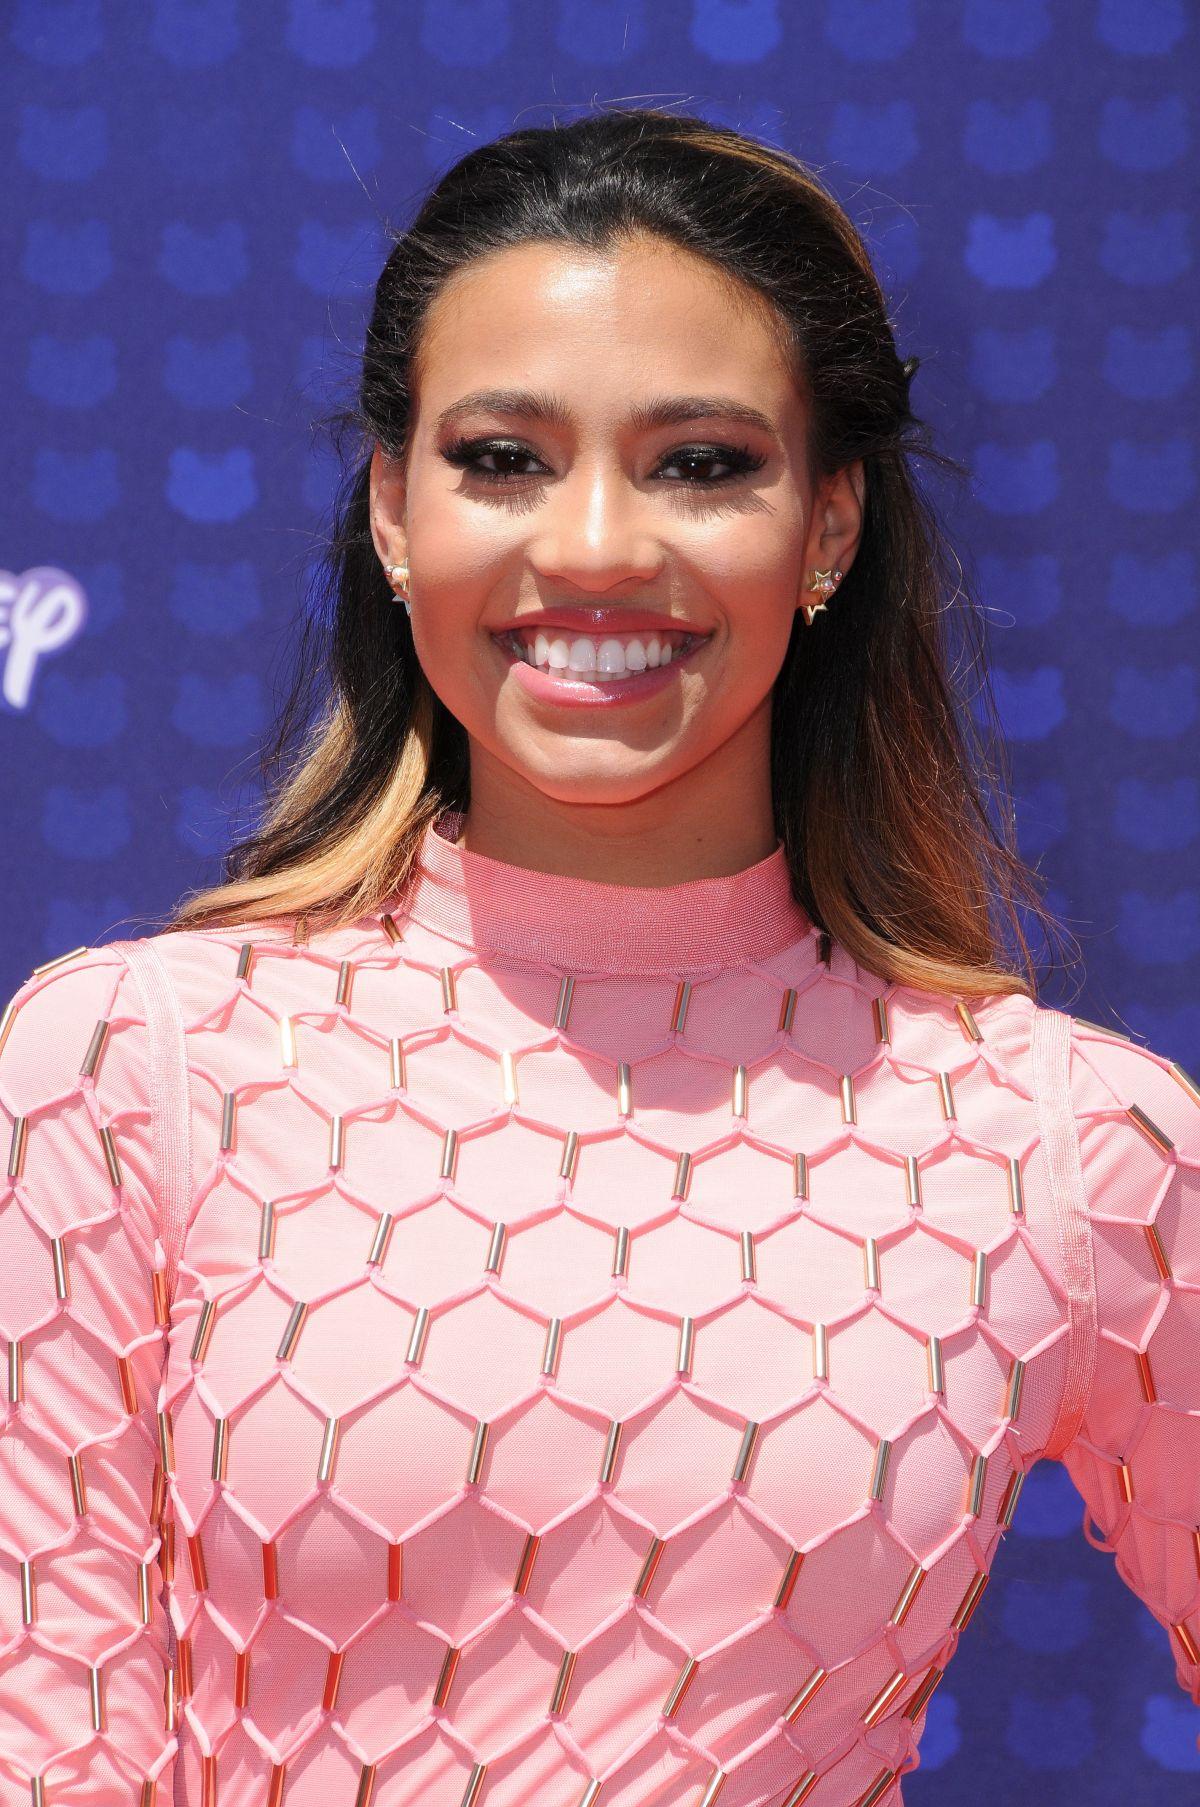 KARA ROYSTER at 2017 Radio Disney Music Awards in Los Angeles 04/29/2017